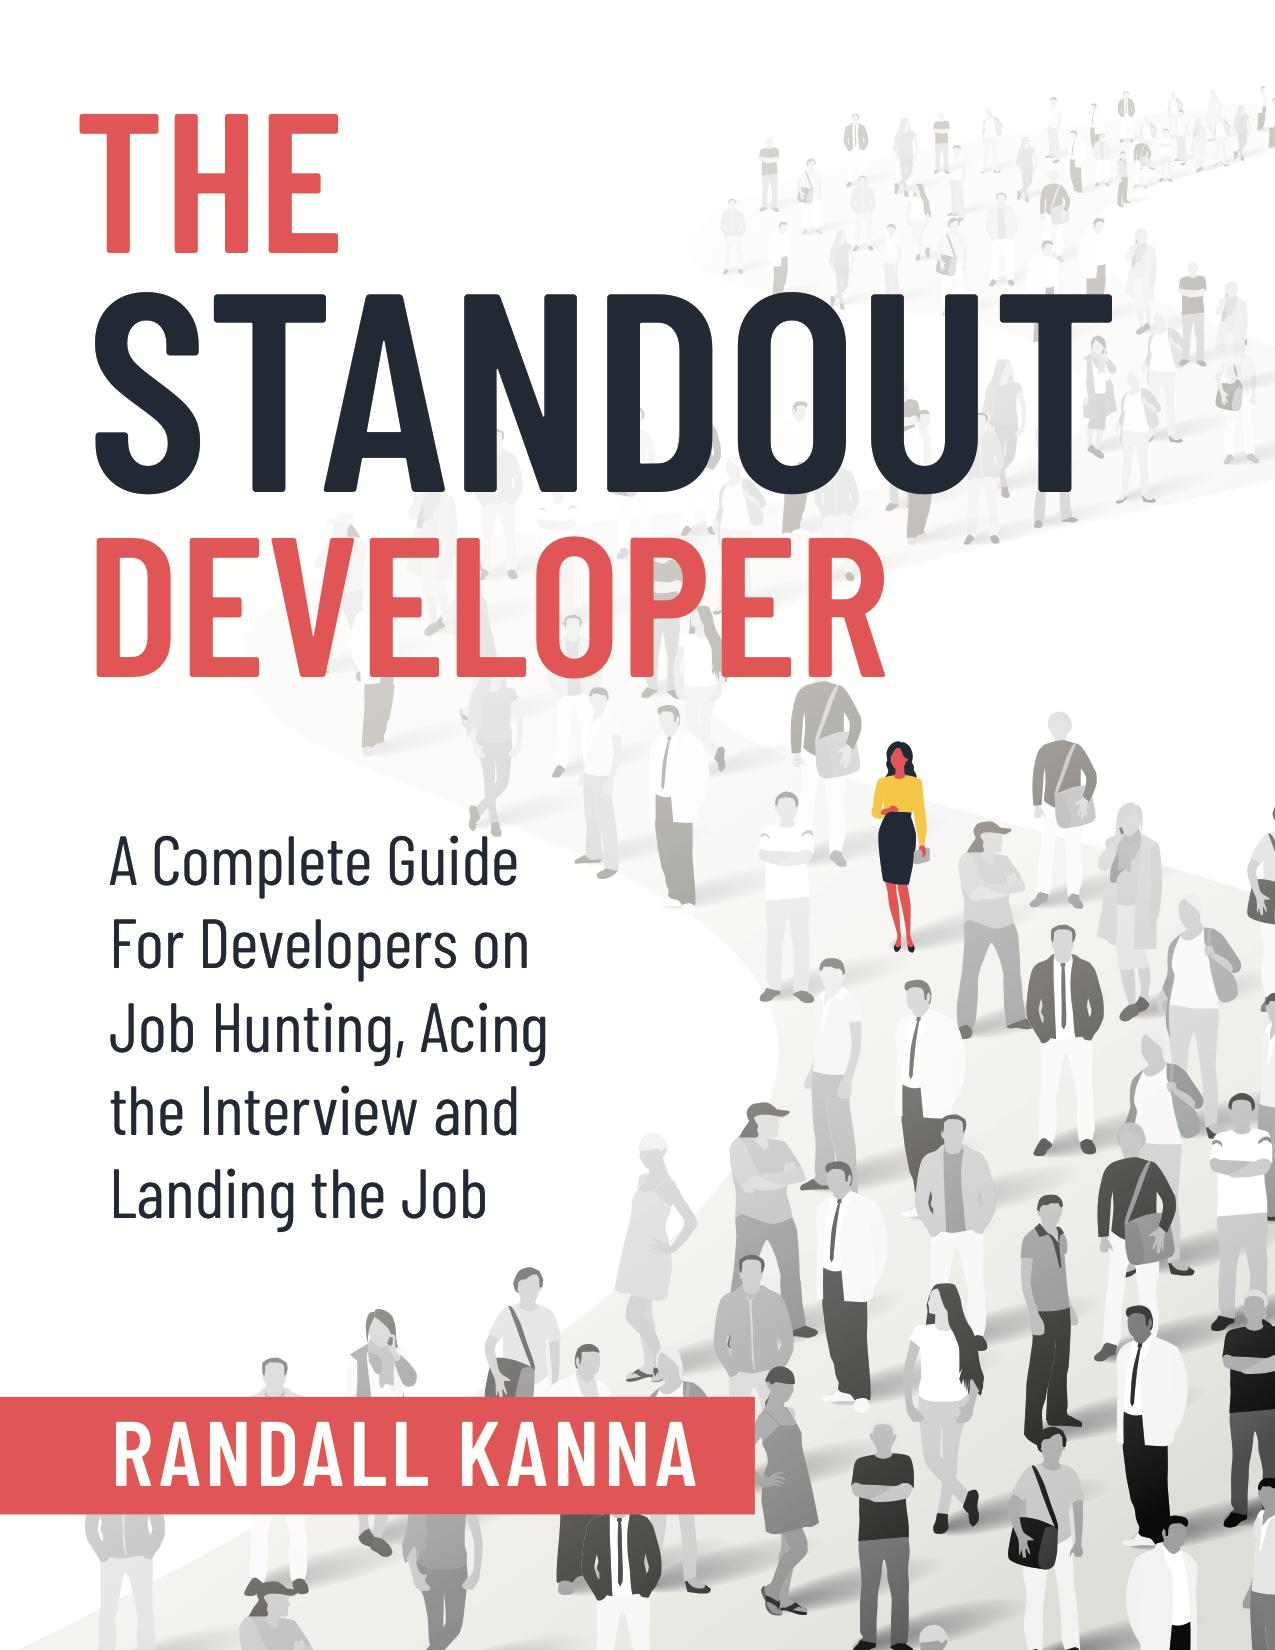 The Standout Developer cover